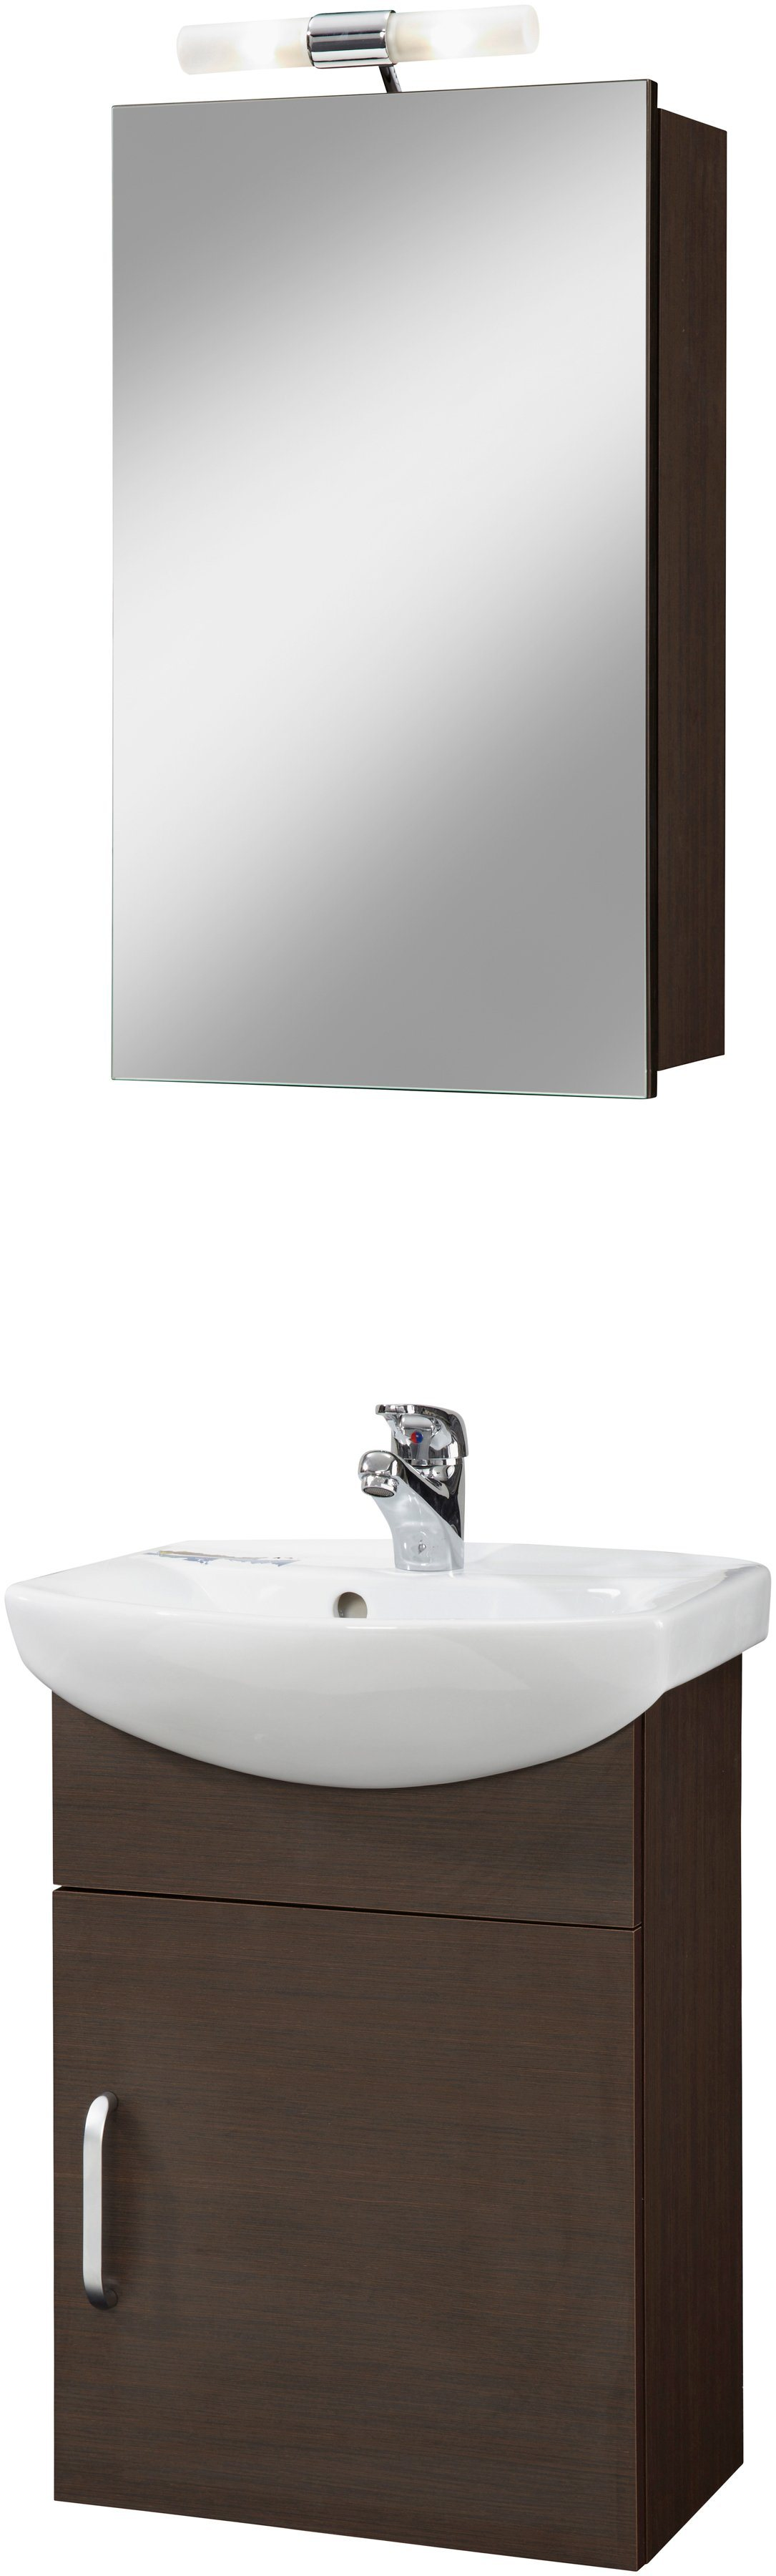 Badmöbel-Set »Milano«, 3-tlg, Breite 45 cm, Tiefe 34,5 cm